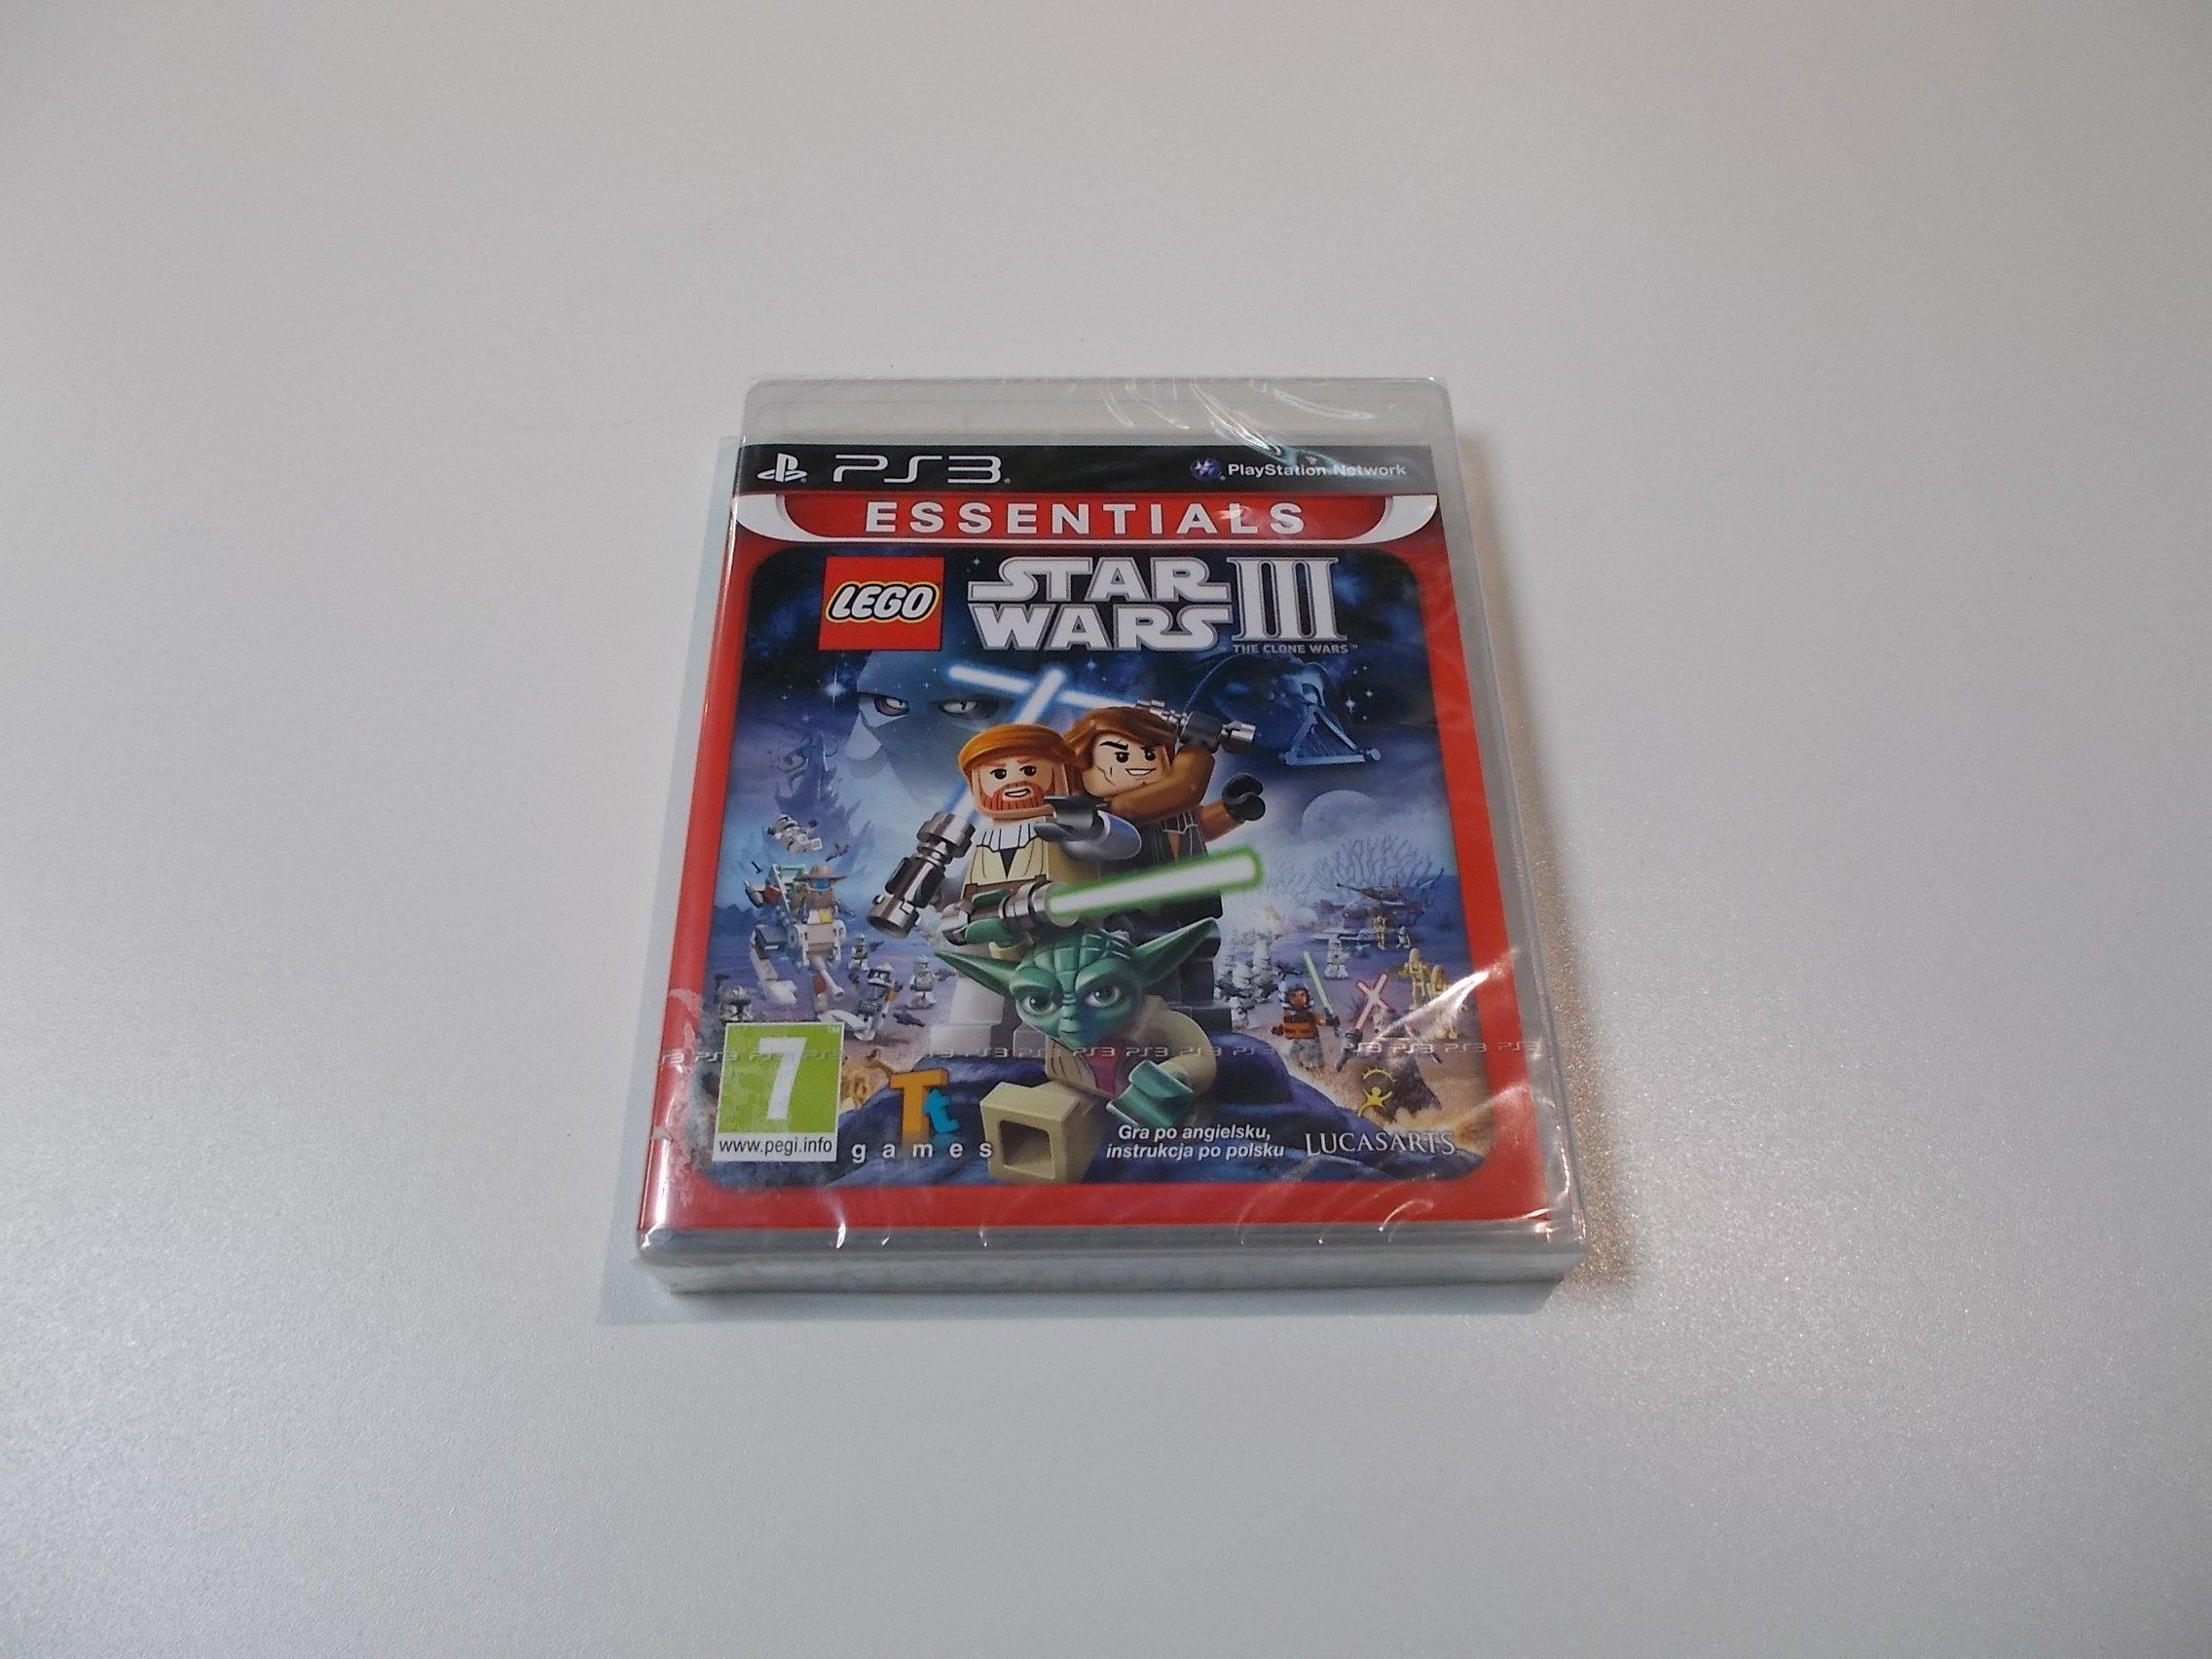 LEGO Star Wars III 3 the clone wars - GRA Ps3 - Opole 0408